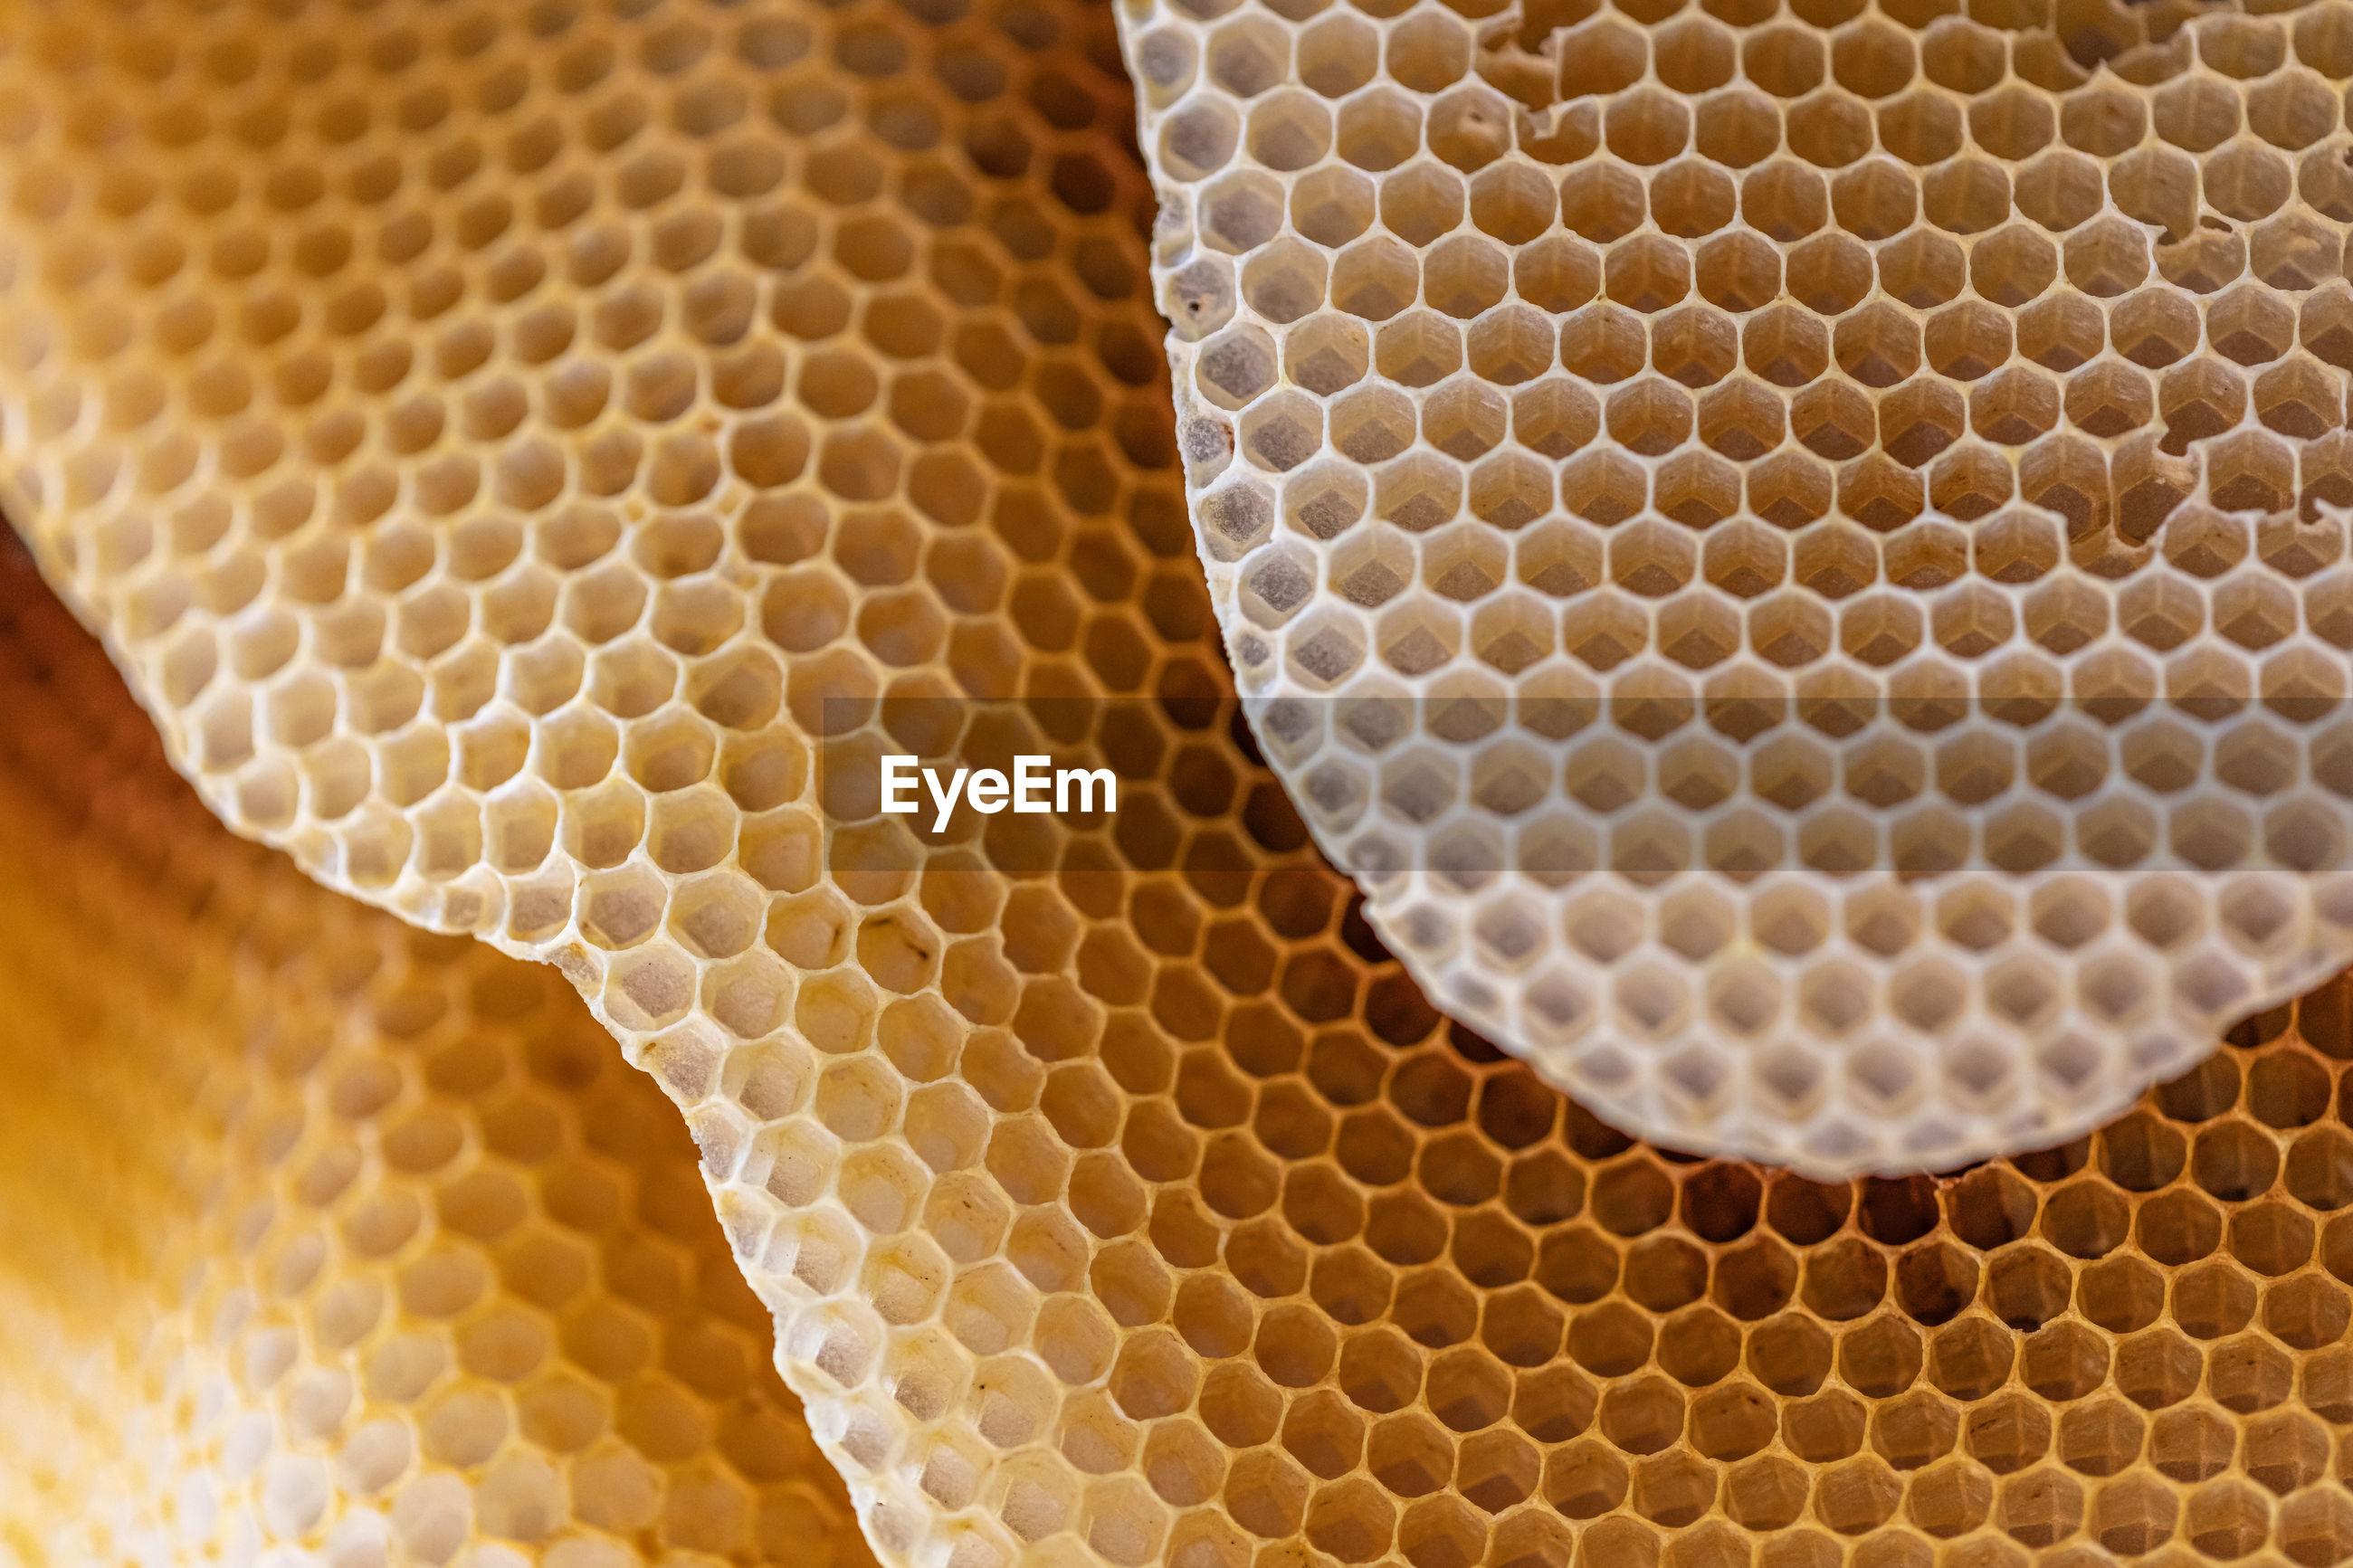 MACRO SHOT OF BEE ON A WALL